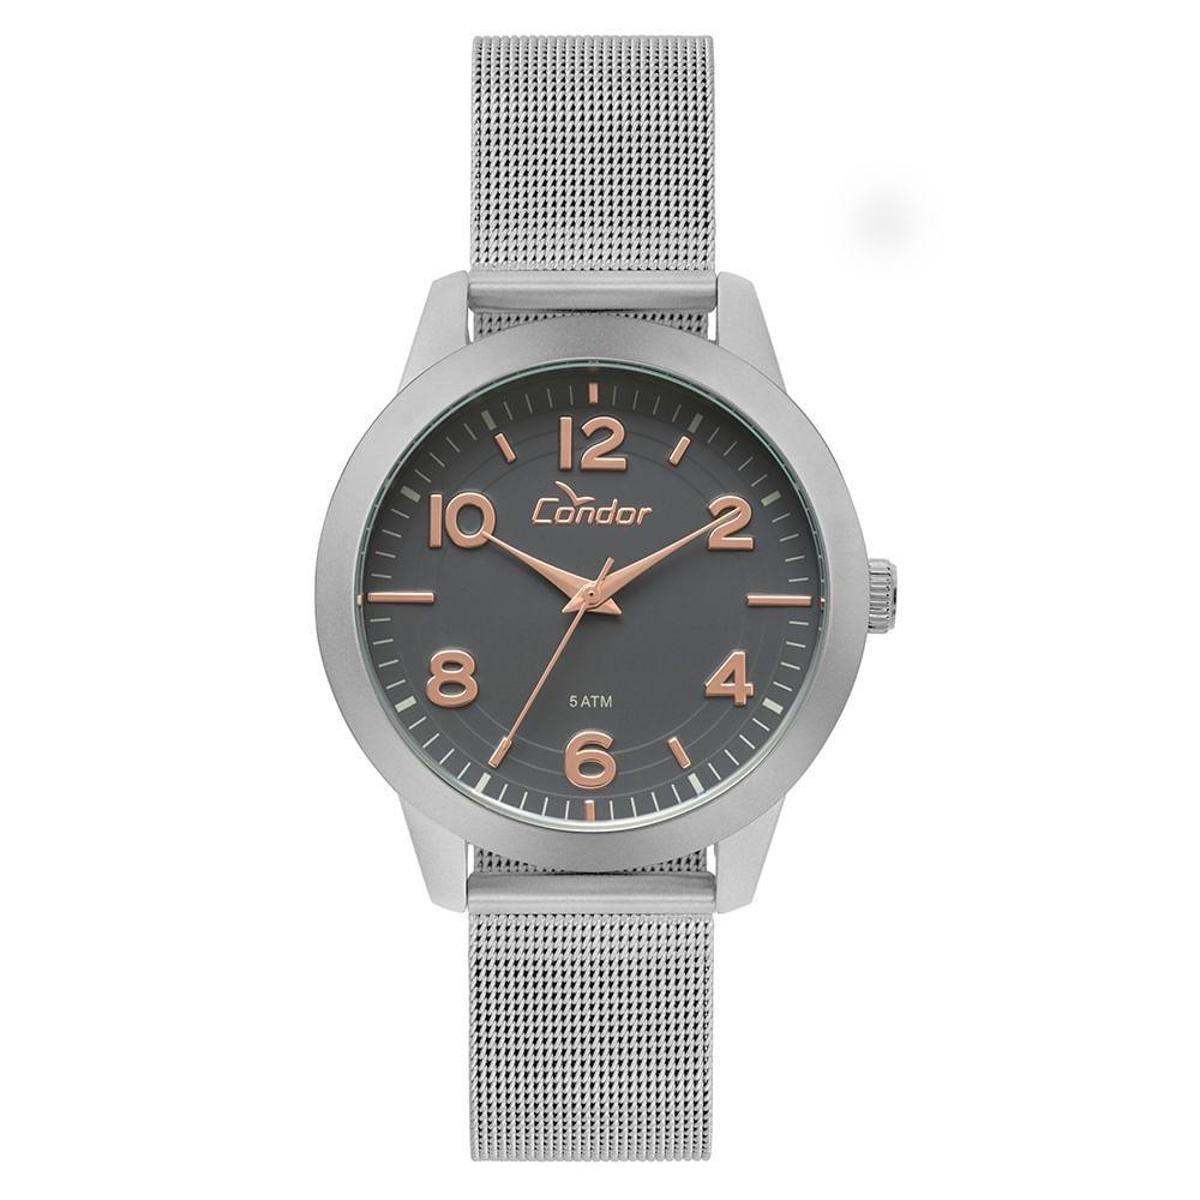 b53d4cecd68 Relógio Condor Feminino Bracelete - CO2036KUP 3C CO2036KUP 3C ...